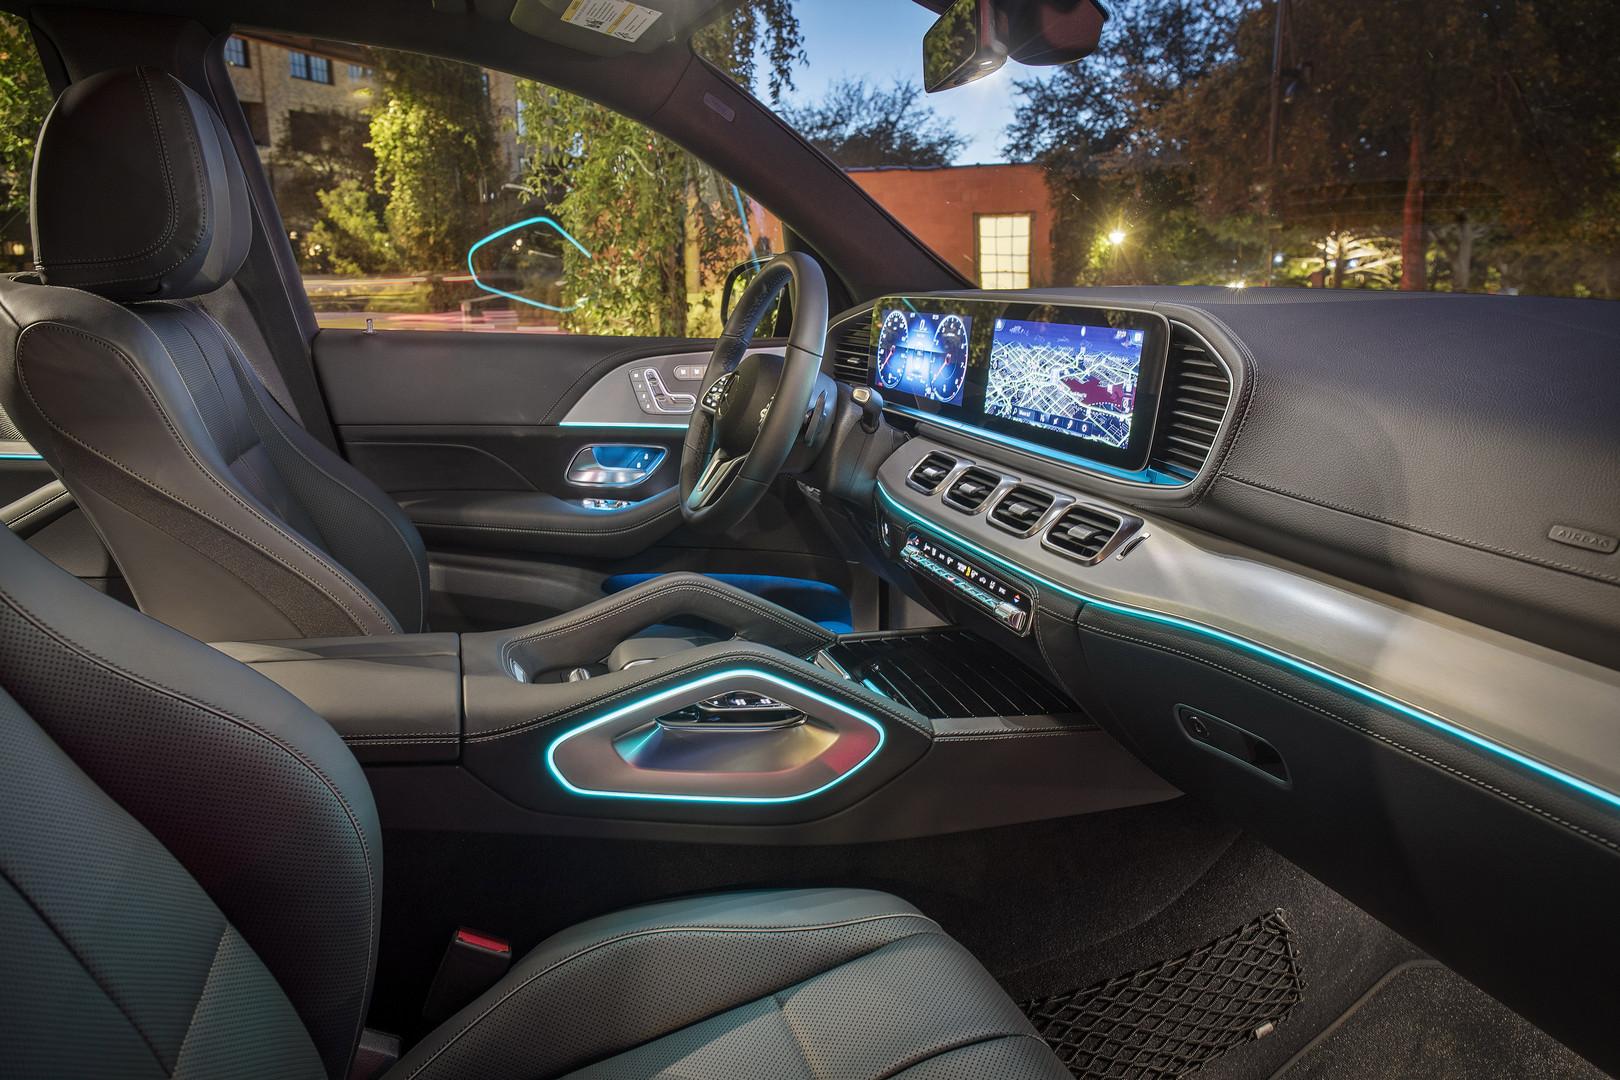 2019 Mercedes-Benz GLE Interior